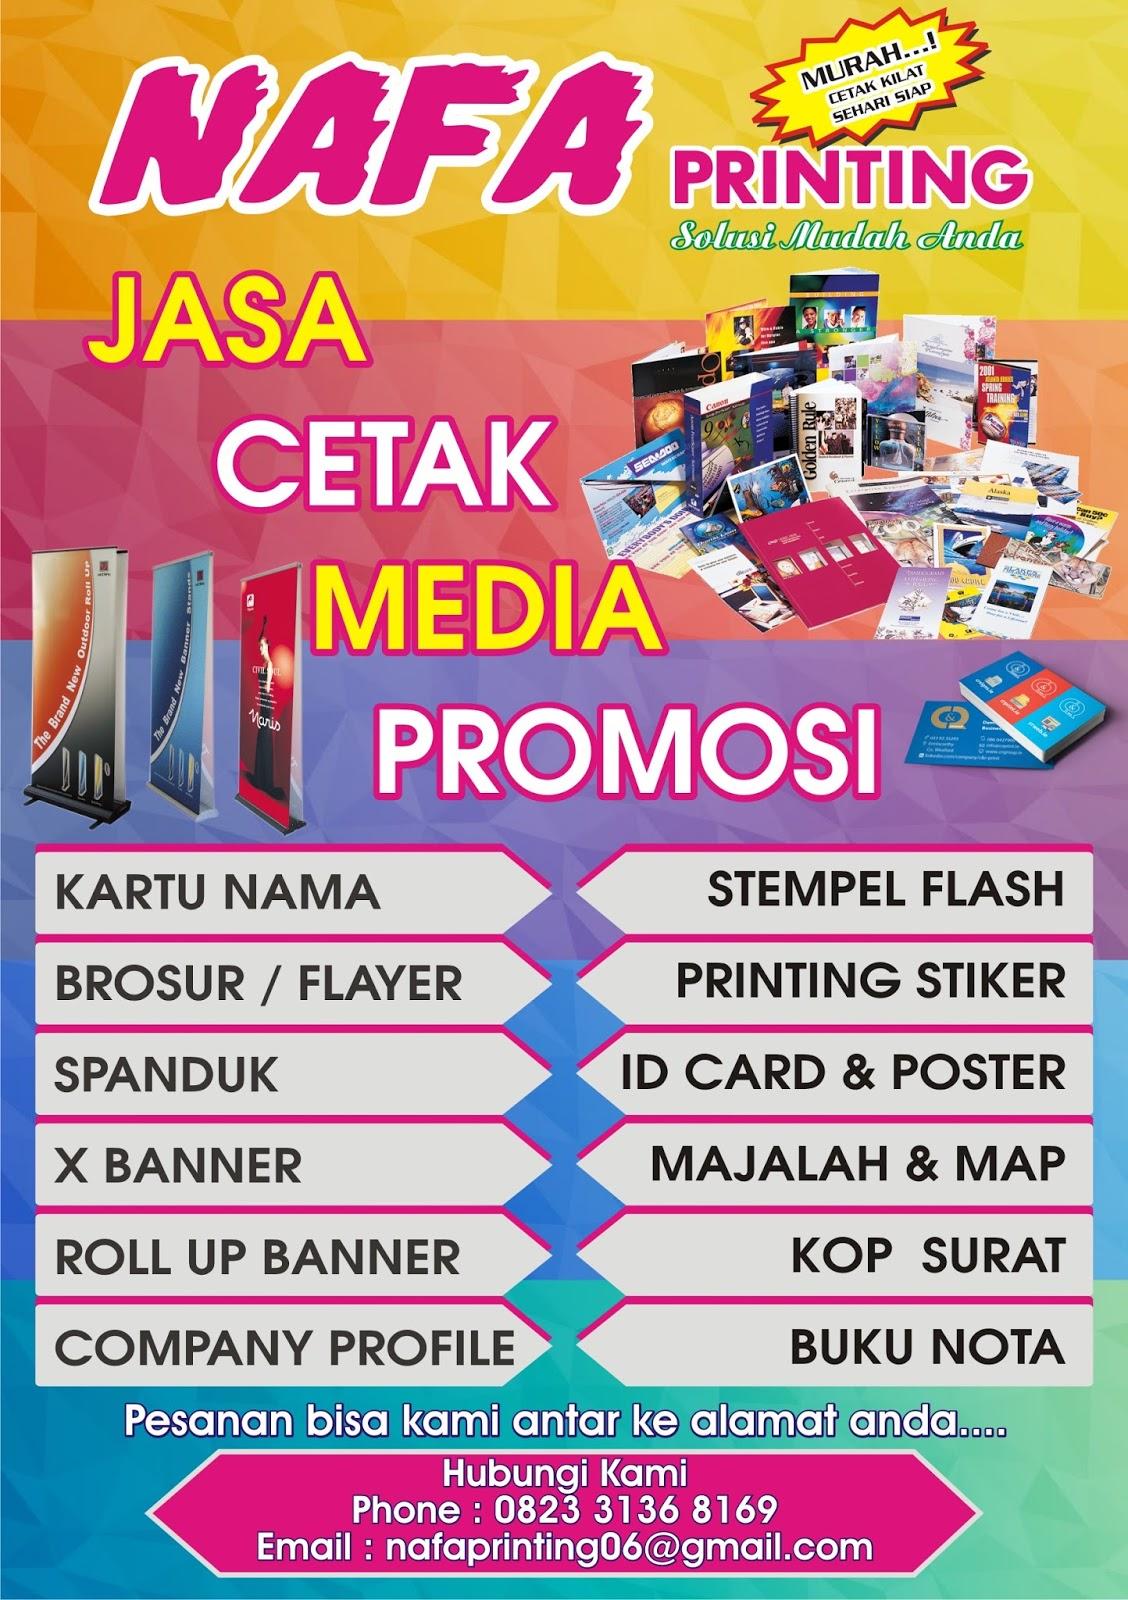 Nafa Printing Cetak Brosur Murah Di Jakarta Timur